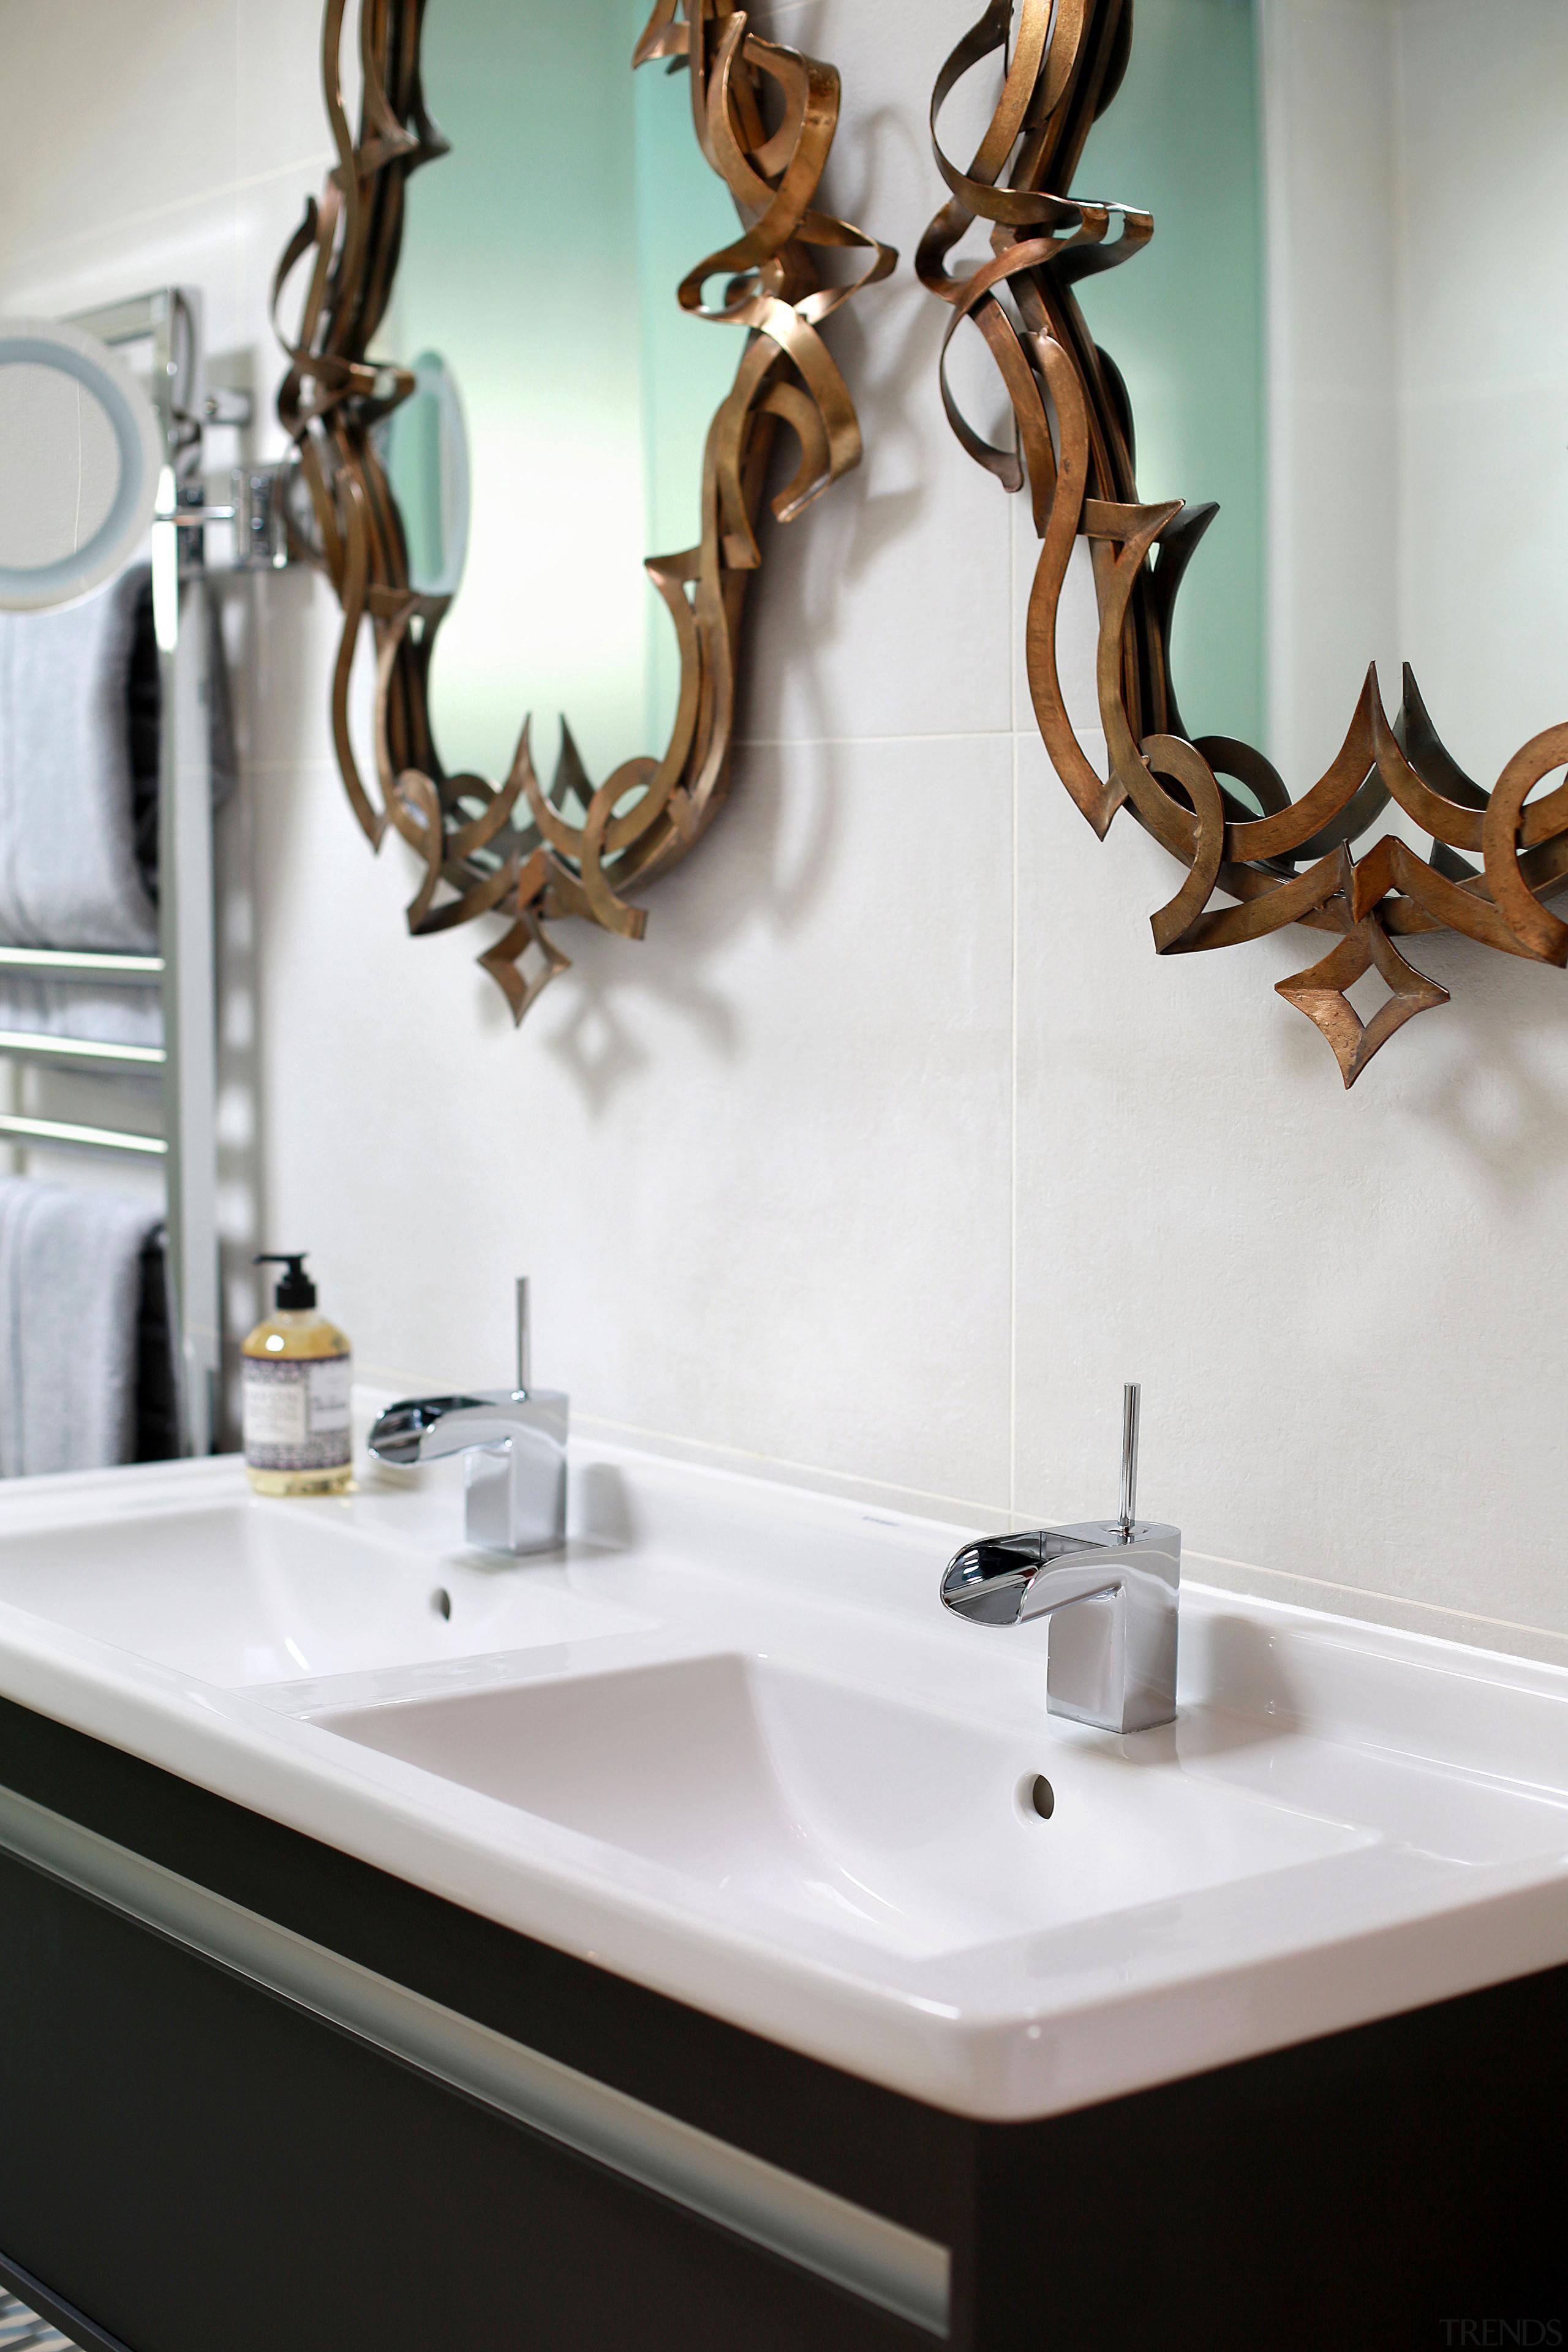 Recessed pulls on this vanity contribute to the bathroom, ceramic, interior design, plumbing fixture, room, sink, tap, white